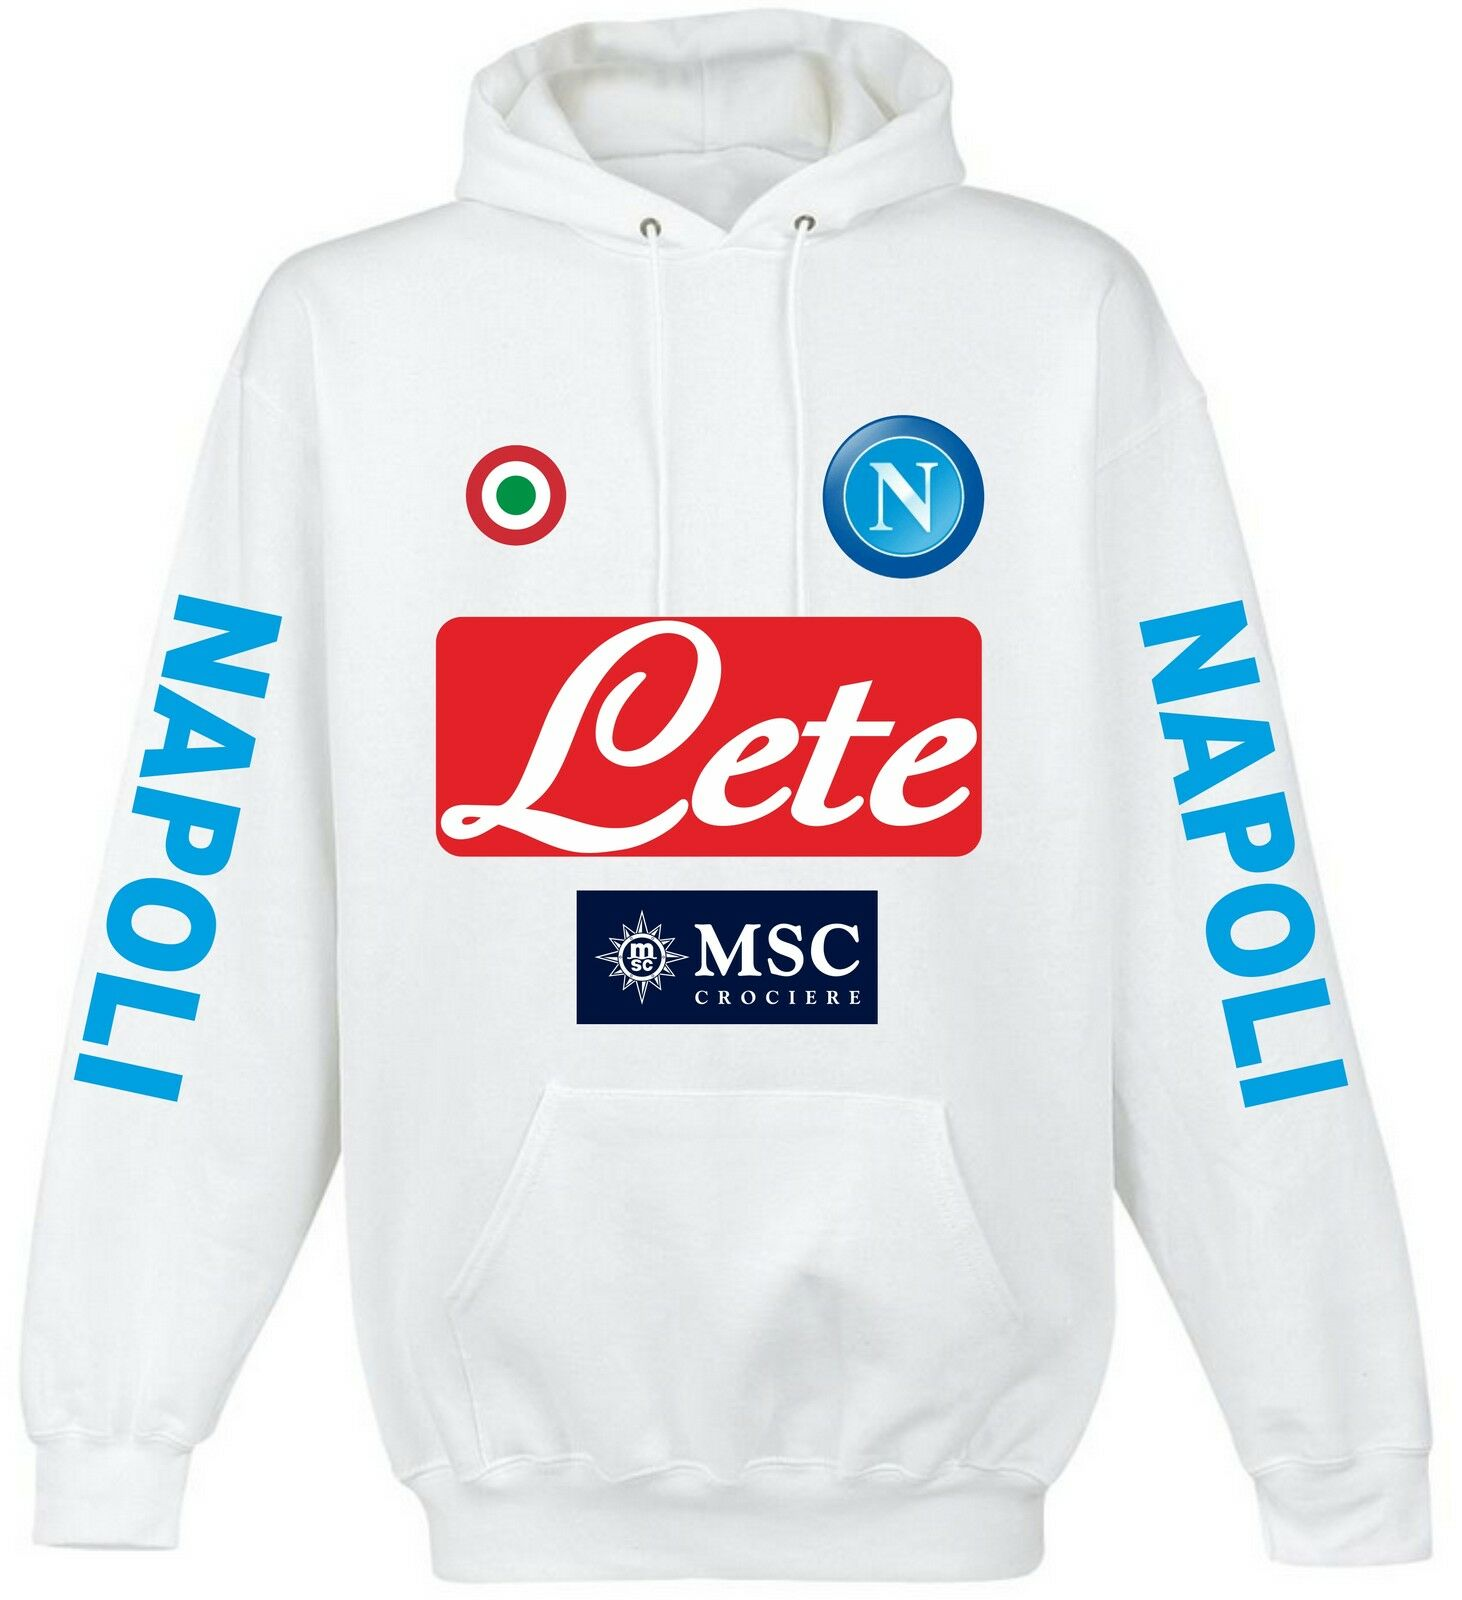 SWEATSHIRT NAPLES WHITE FOOTBALL A league ITALIE WHITE POLO shirt t-shirt